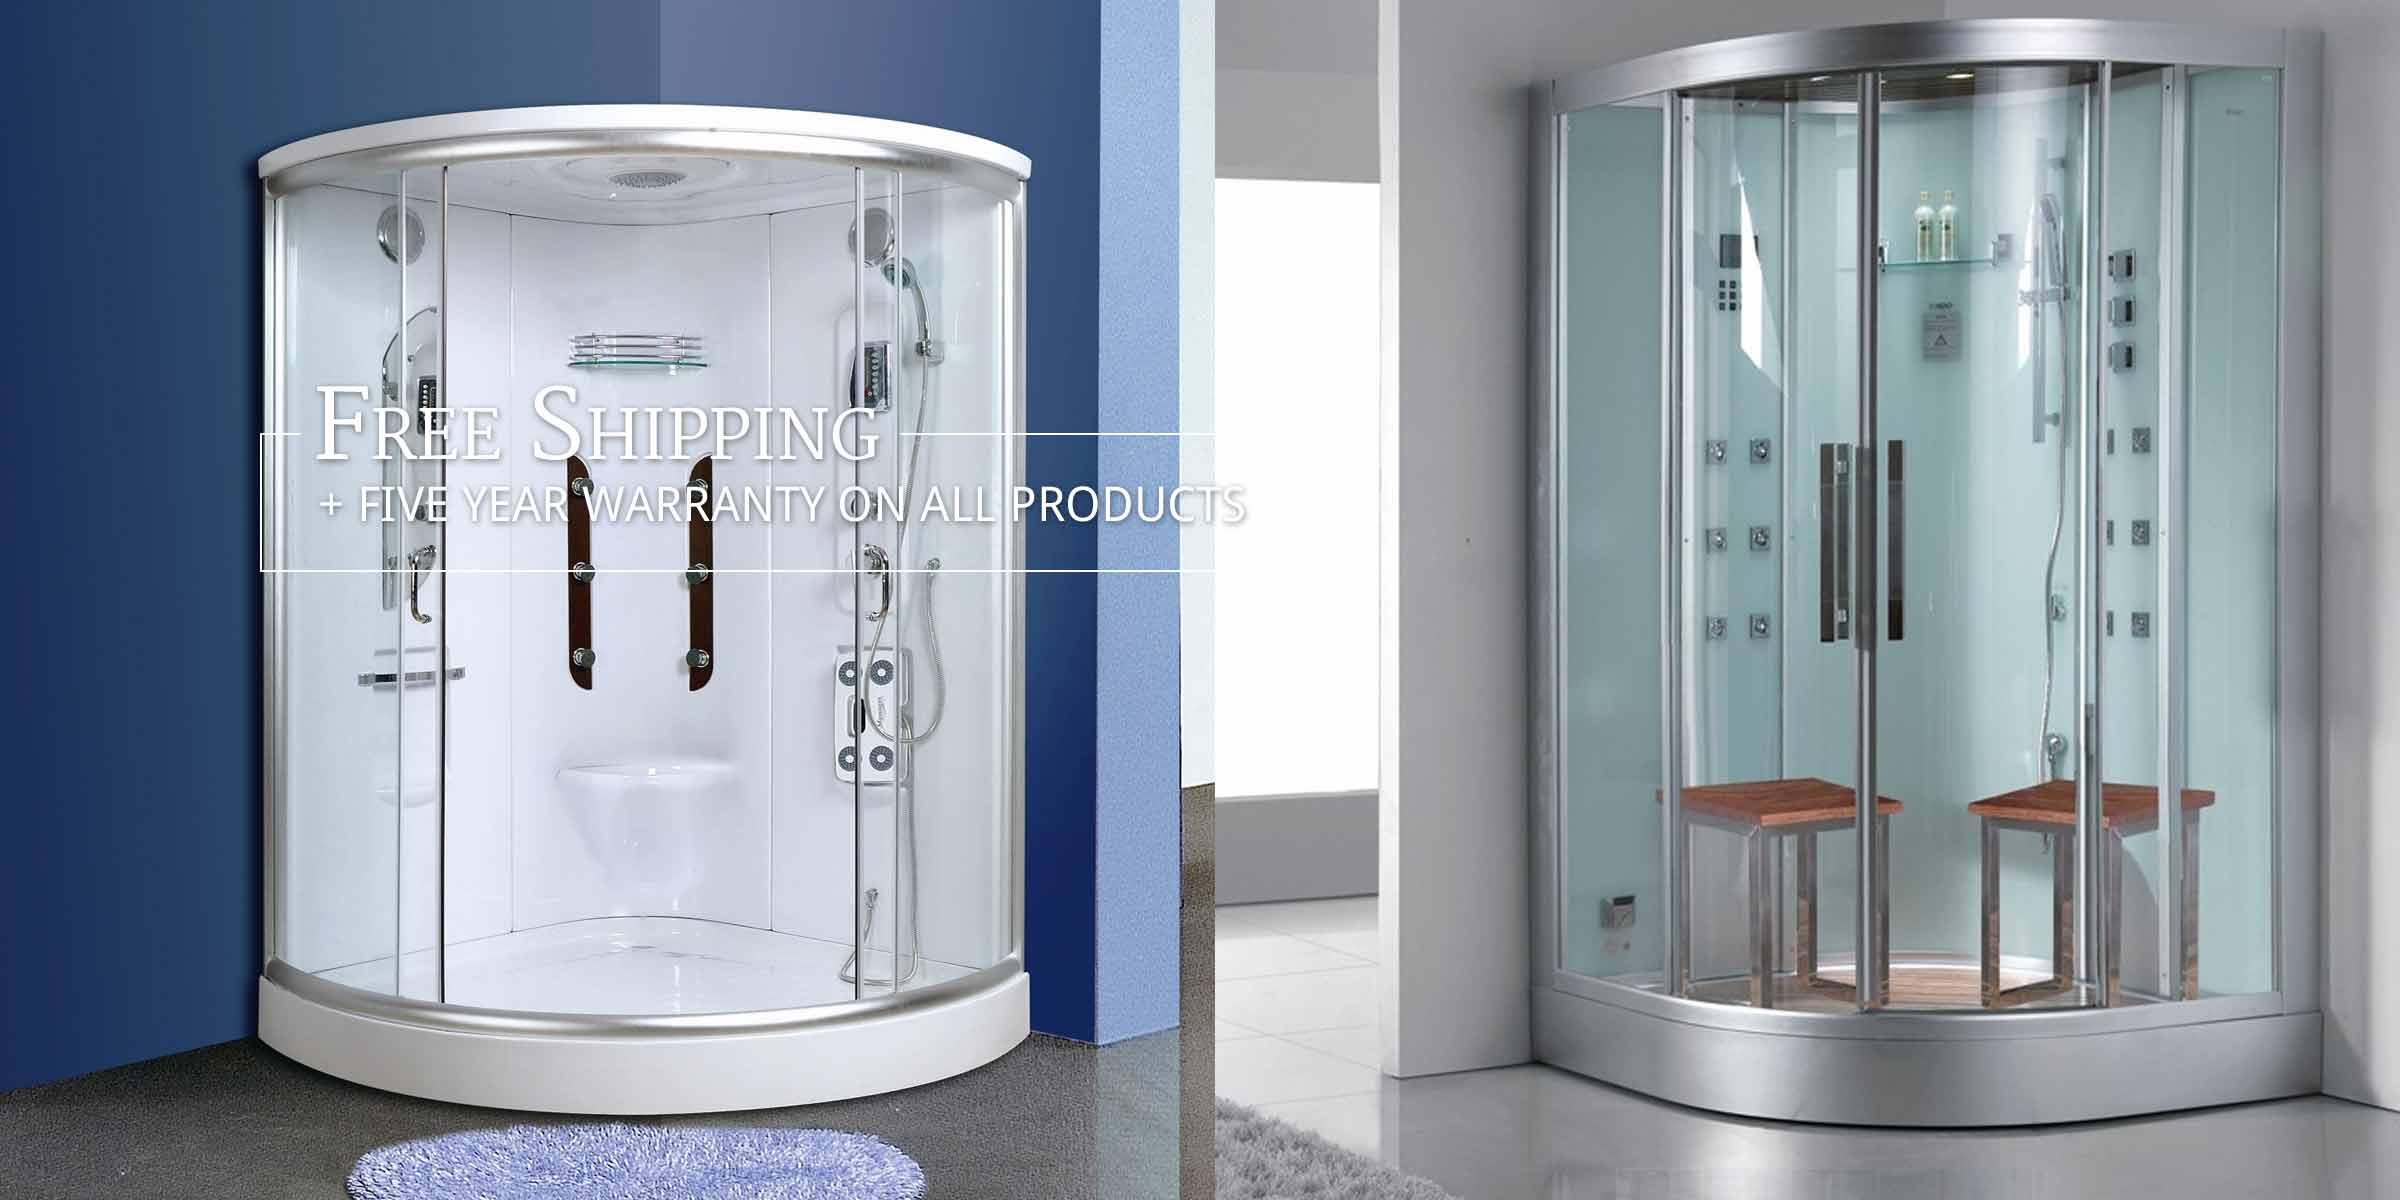 Photo: Steam Shower & Hyrdo Shower in 2 different bathrooms. Text: Free Shipping + Five Year Warranty